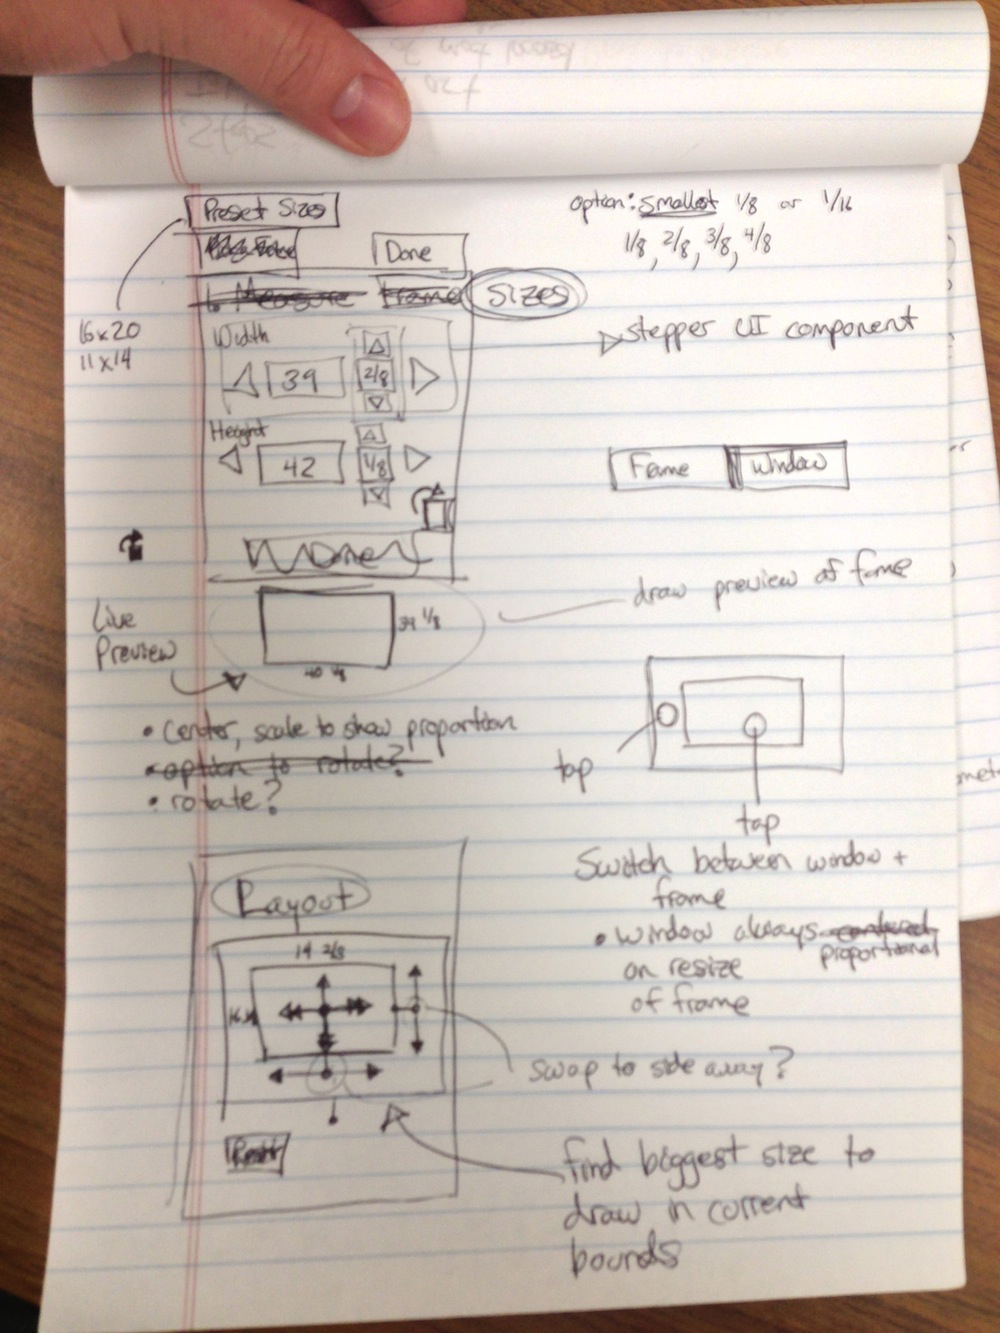 Mat Border Calculator - Making Framing Easy - image 7 - student project